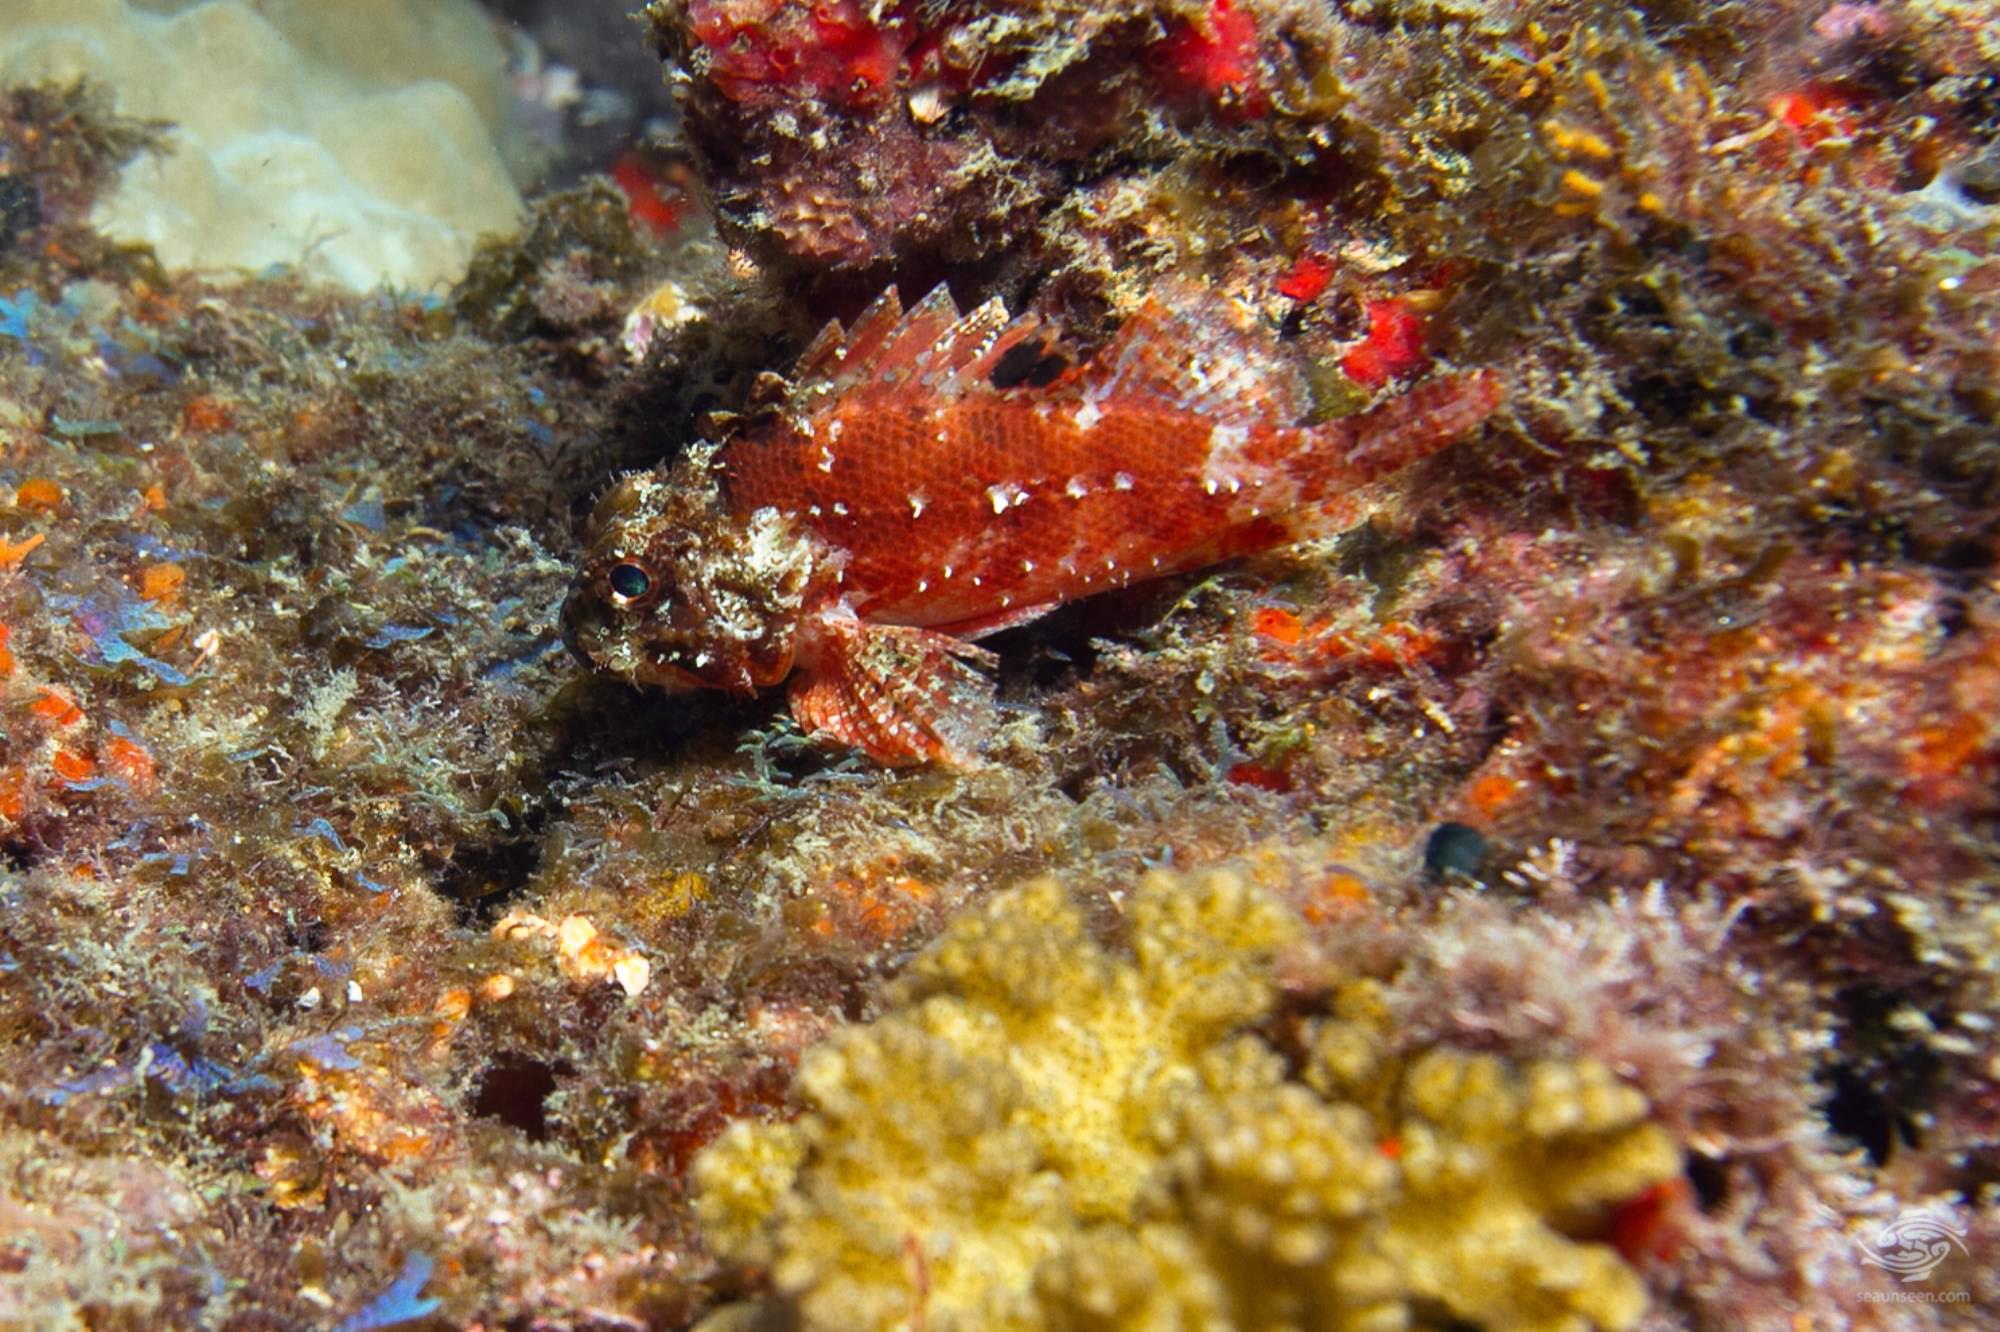 Juvenile tasseled scorpionfish